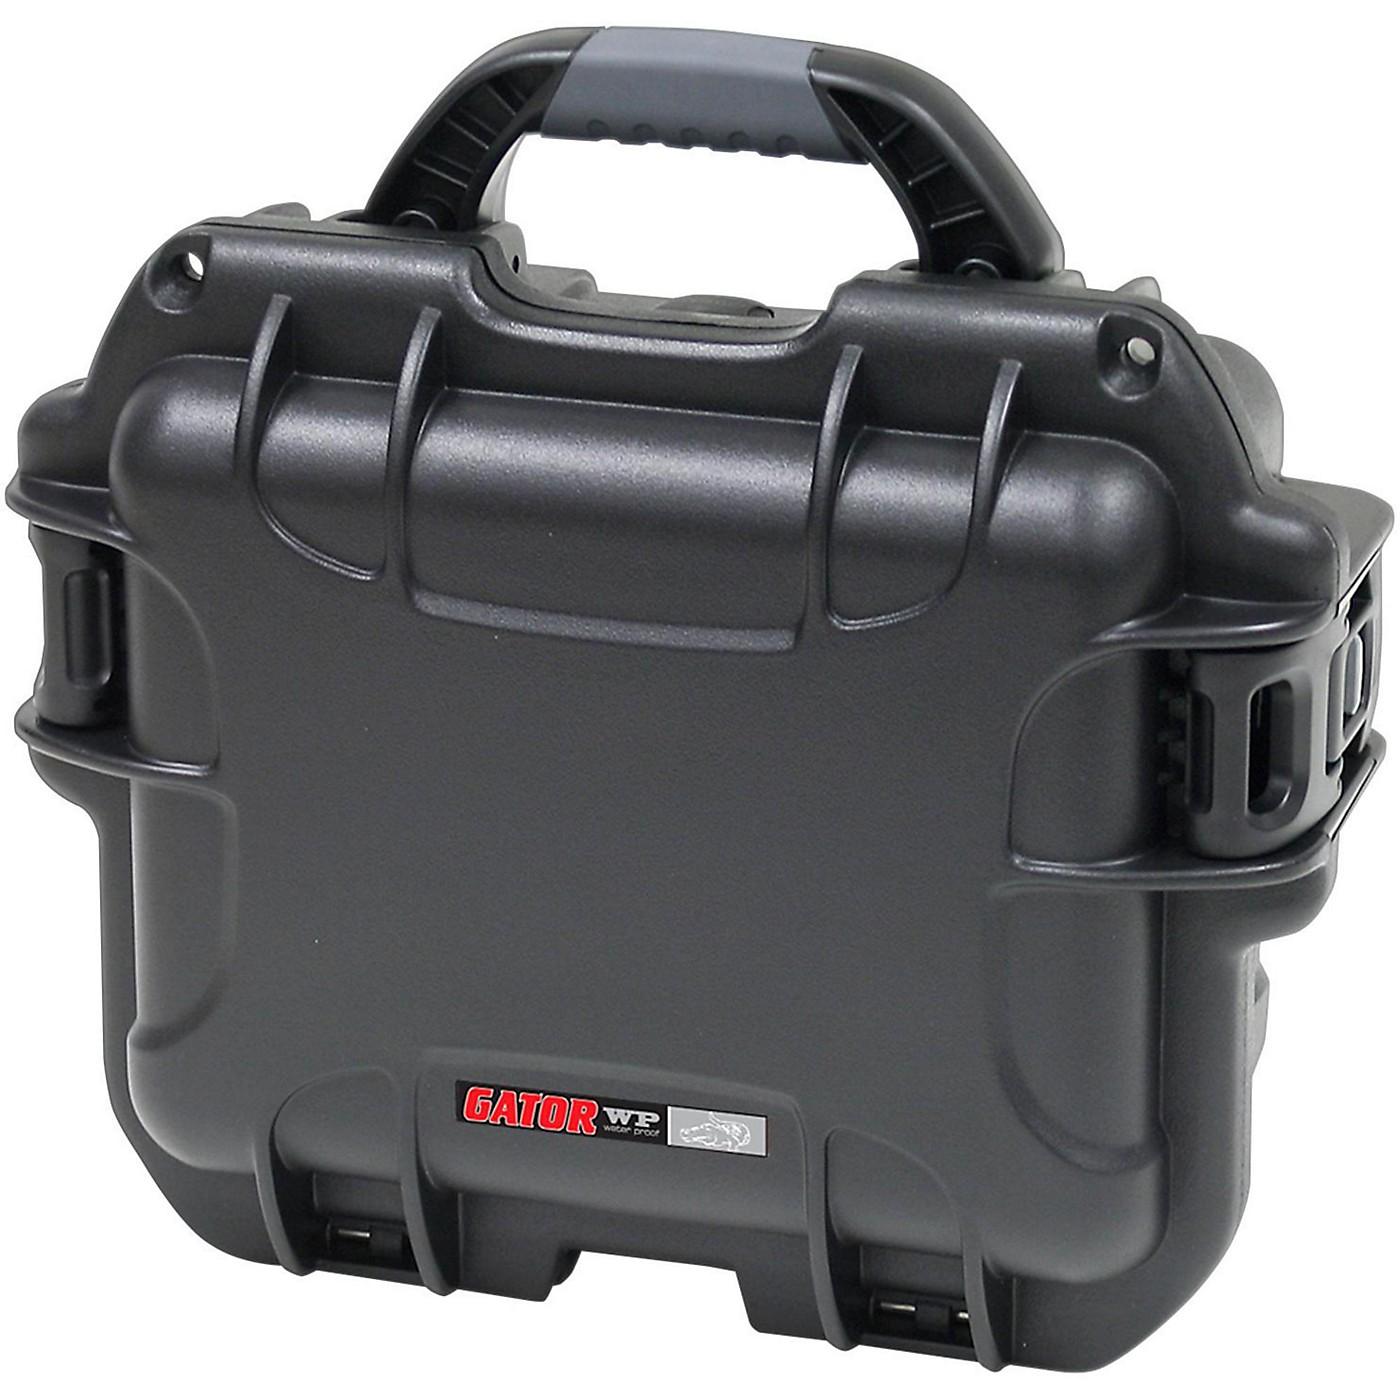 Gator GU-ZOOMH4N-WP Waterproof Injection Molded Case for Zoom H4N Handheld Recorder thumbnail